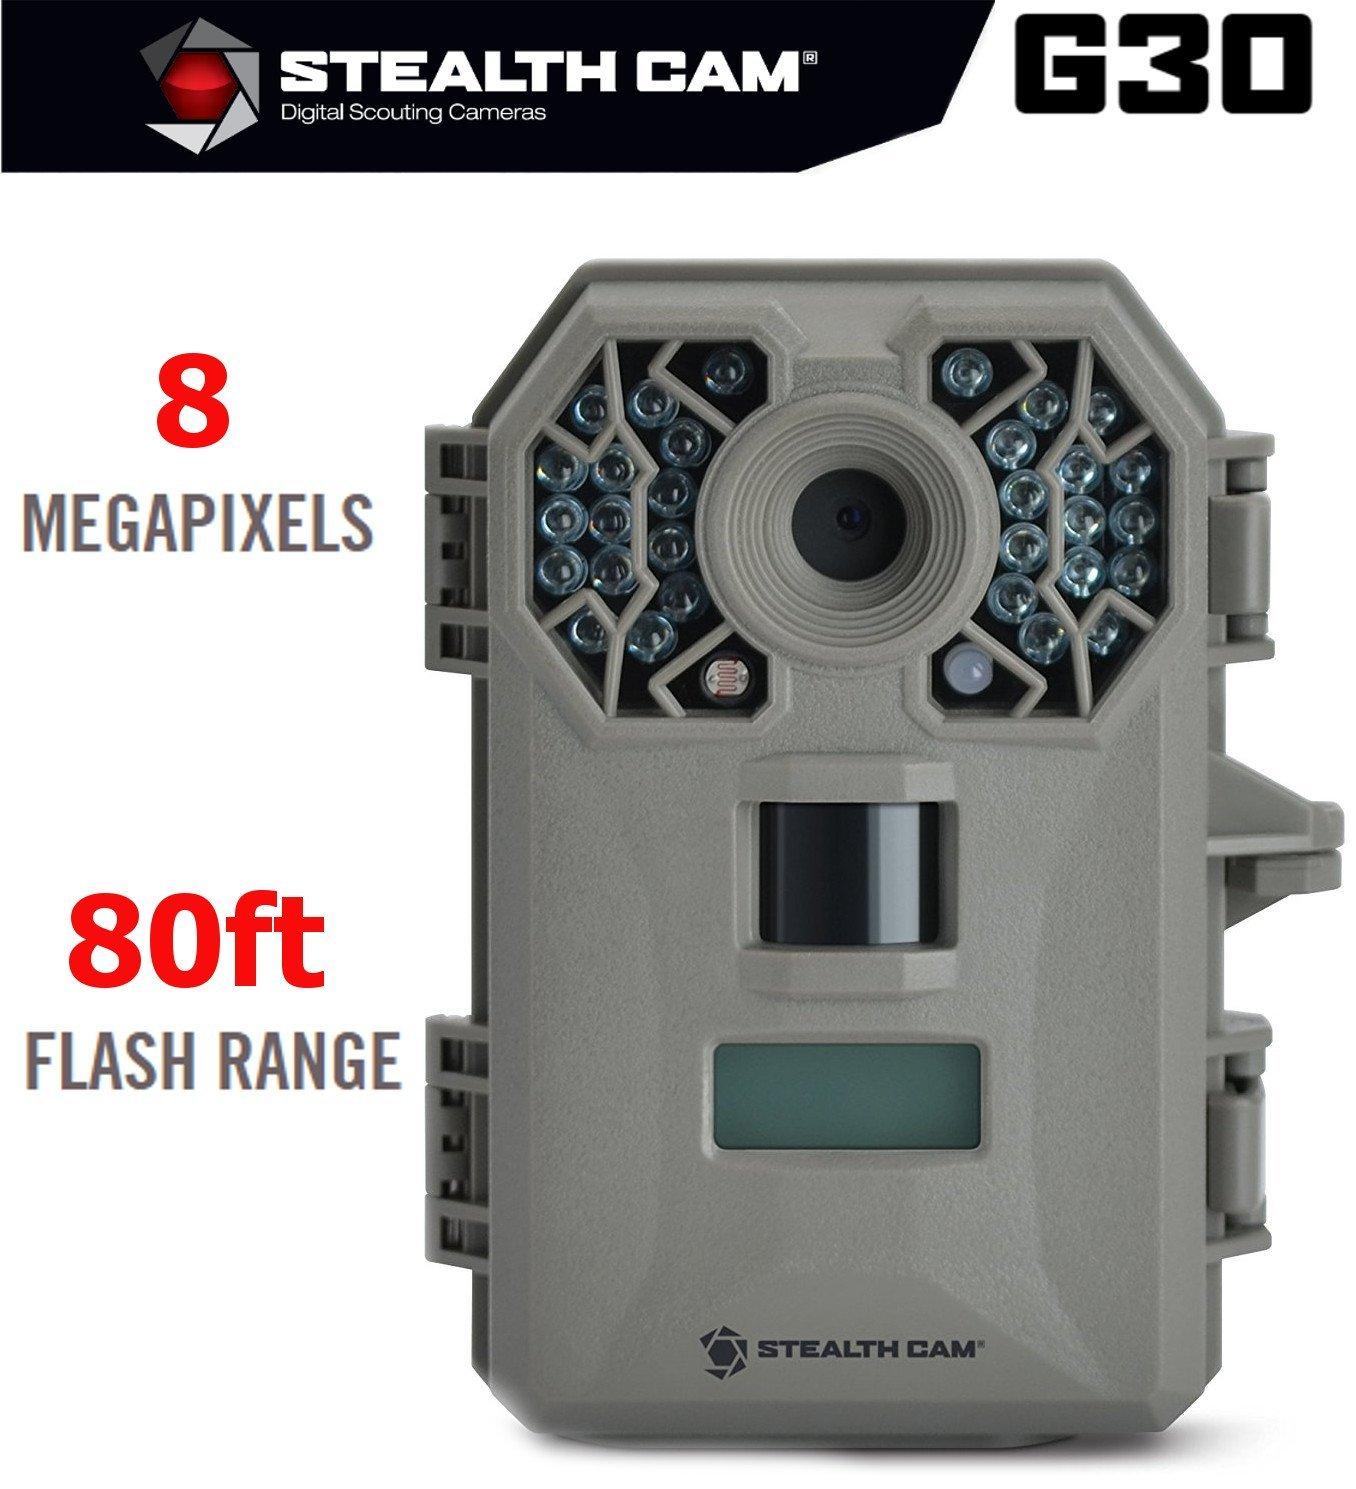 Wireless Trail Camera, Stealth Cam G30 8mp Game Hunting Trail Camera Wireless